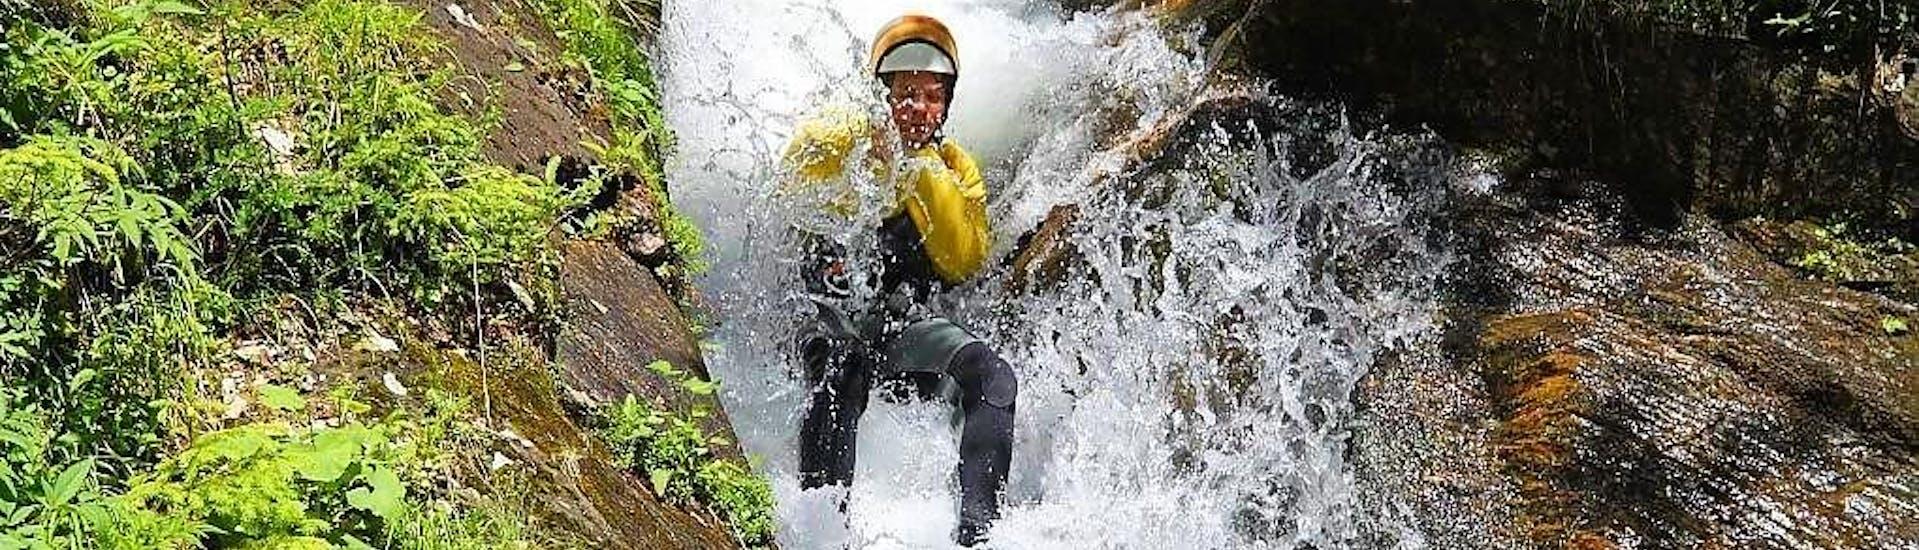 canyoning-integral-zoesenklamm-hero